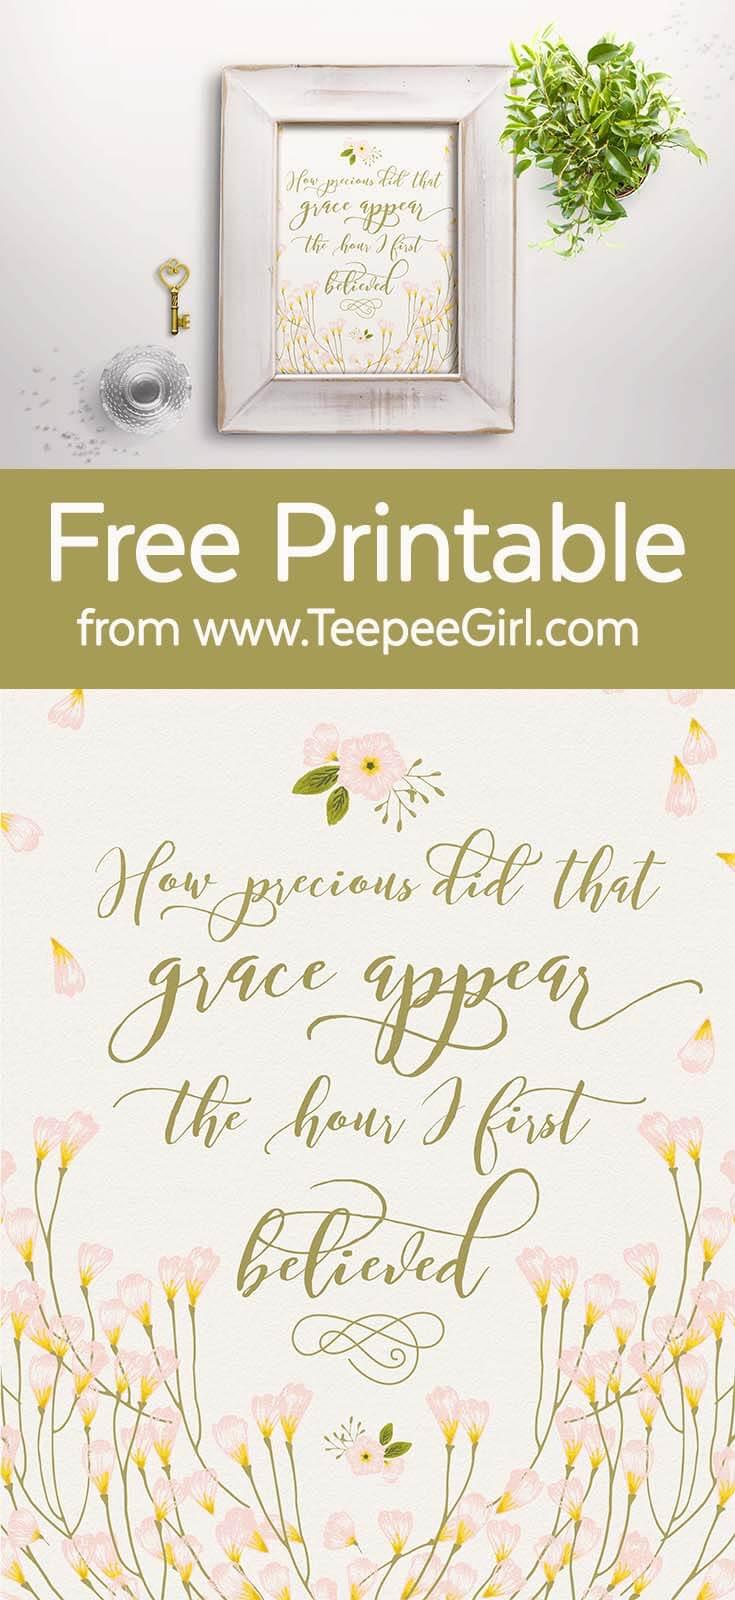 Amazing Grace Free 8x10 Printable from www.TeepeeGirl.com